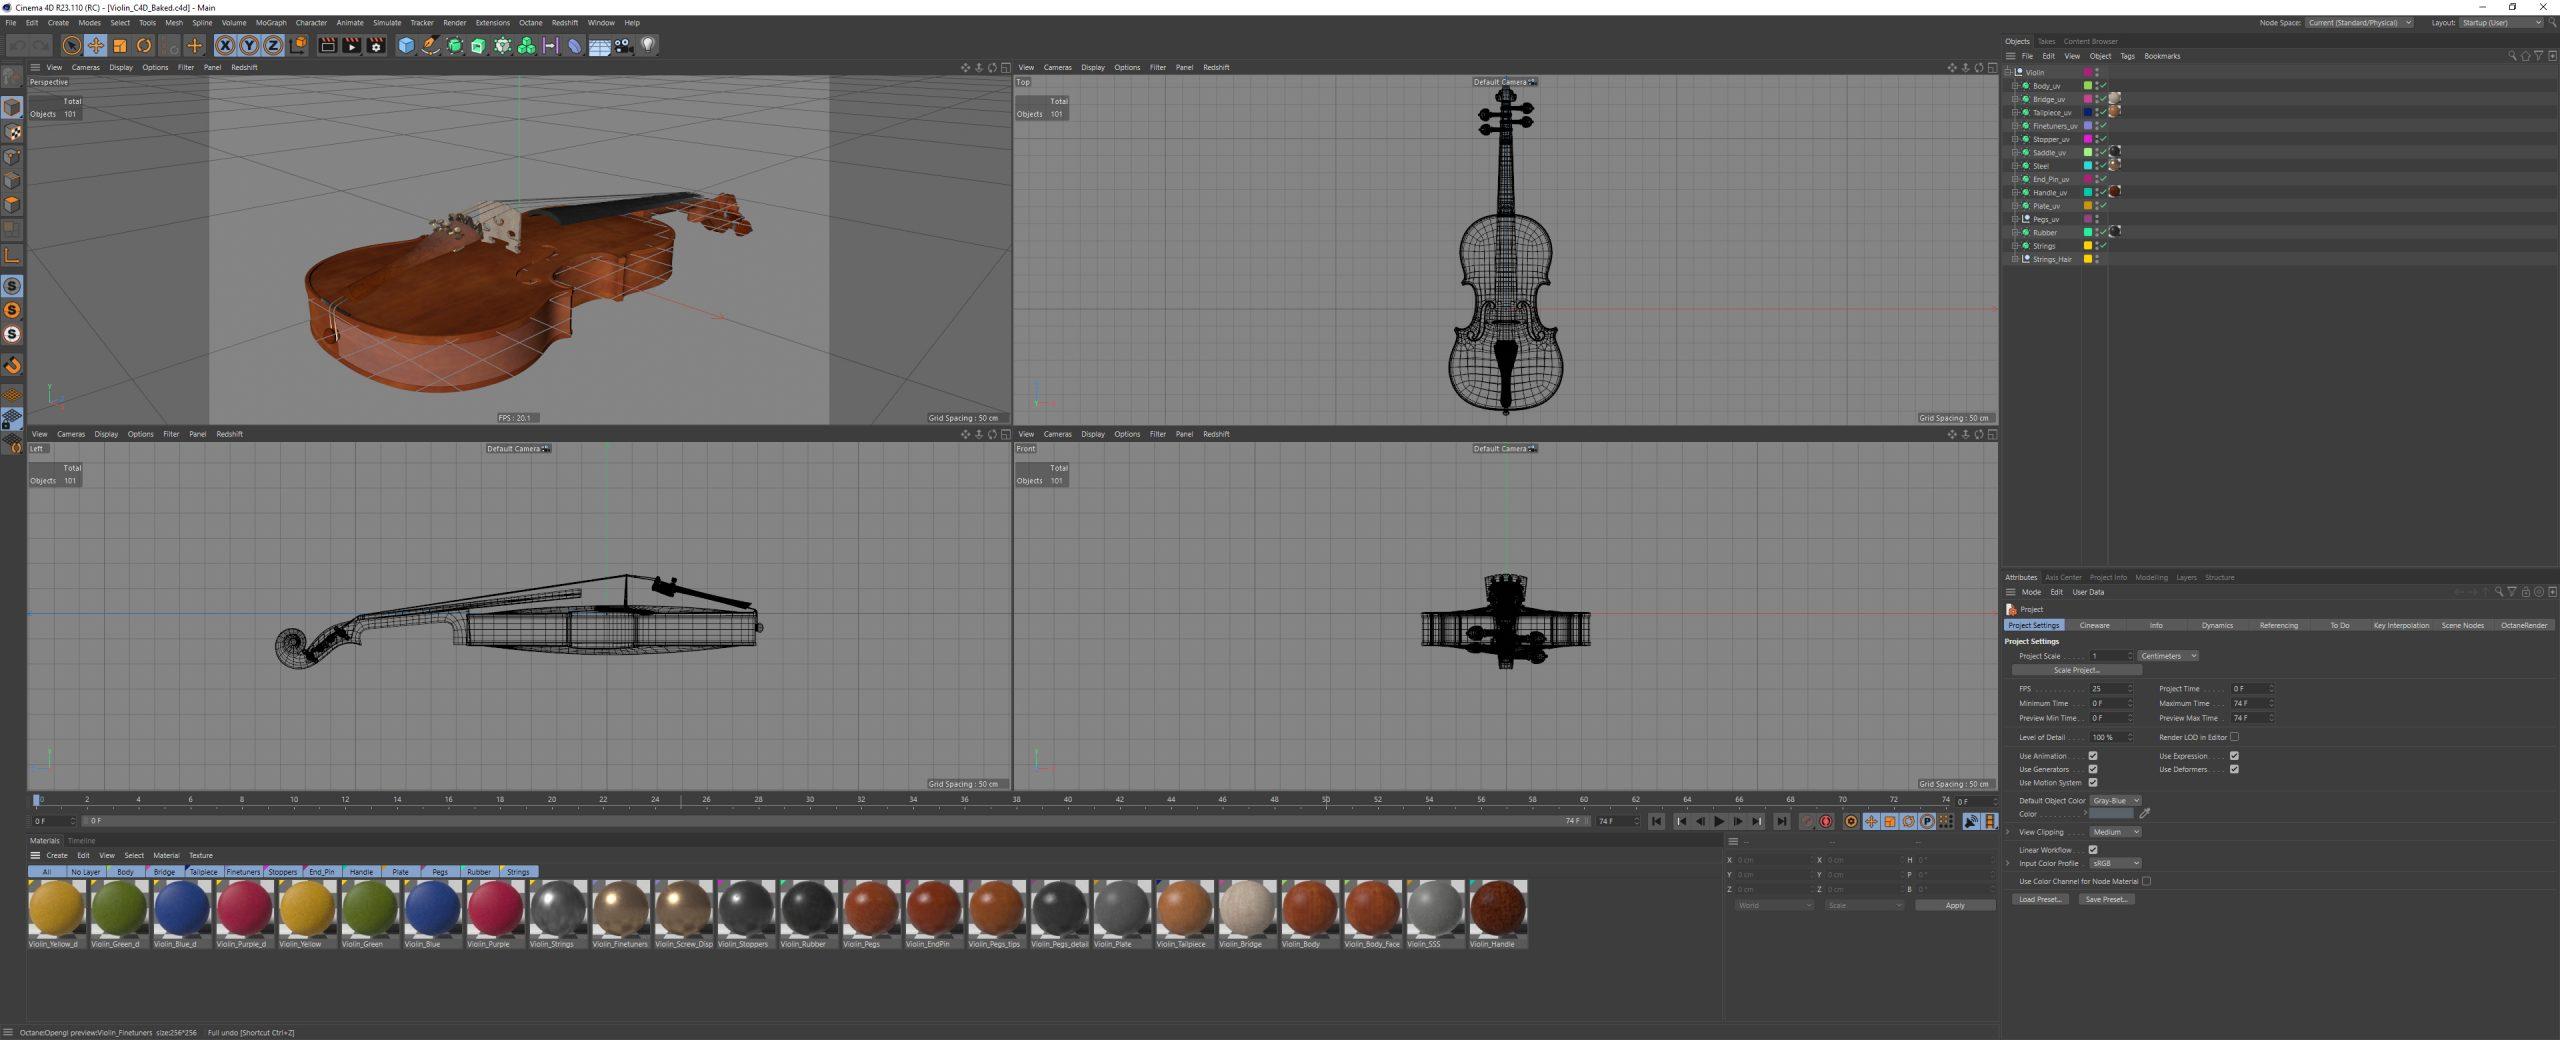 Violin_C4D_Preview